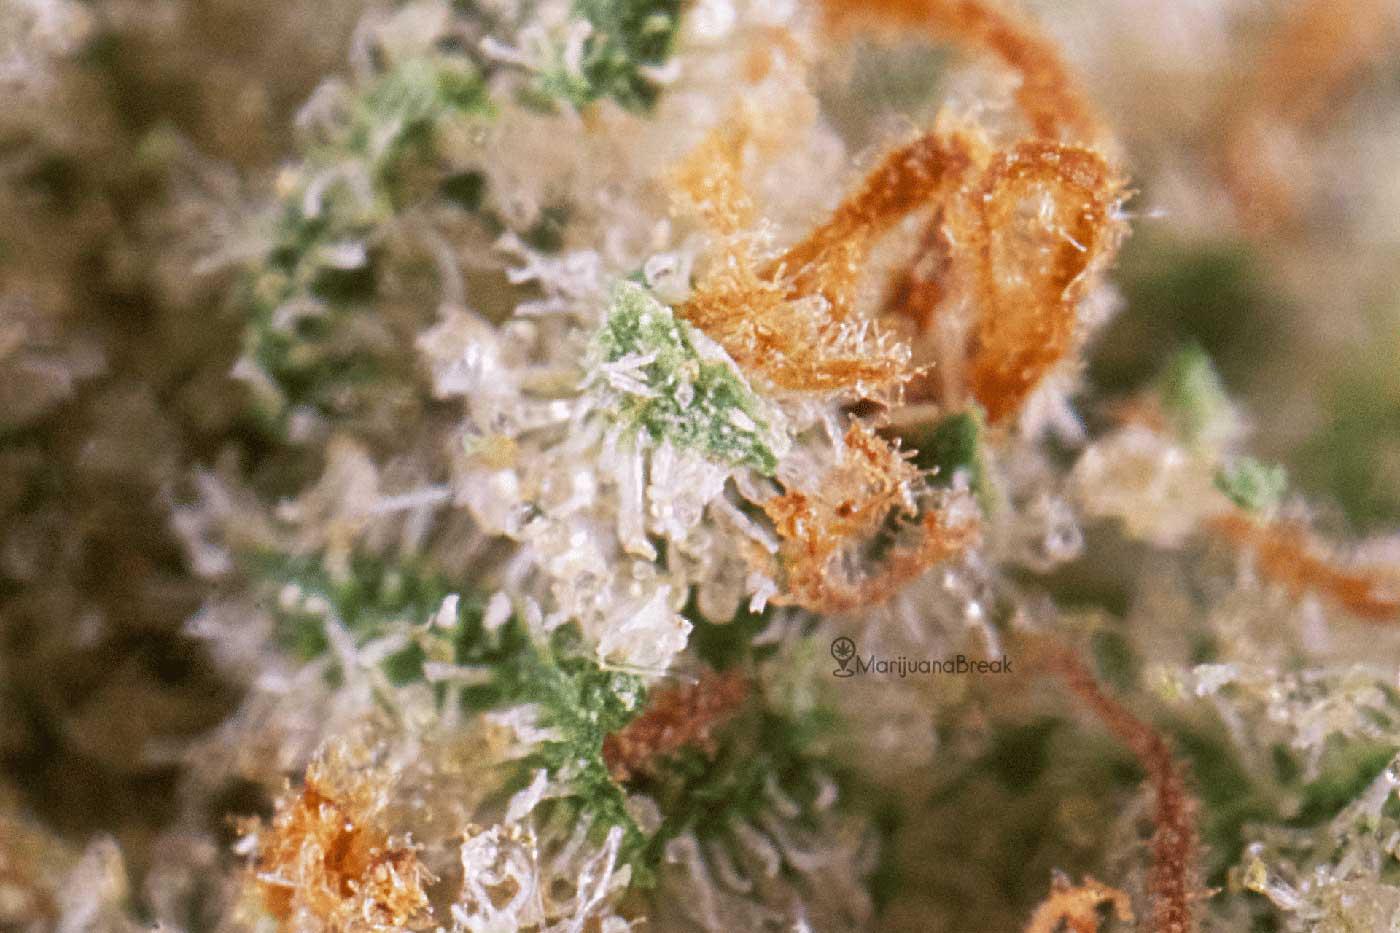 Ghost Train Haze Marijuana